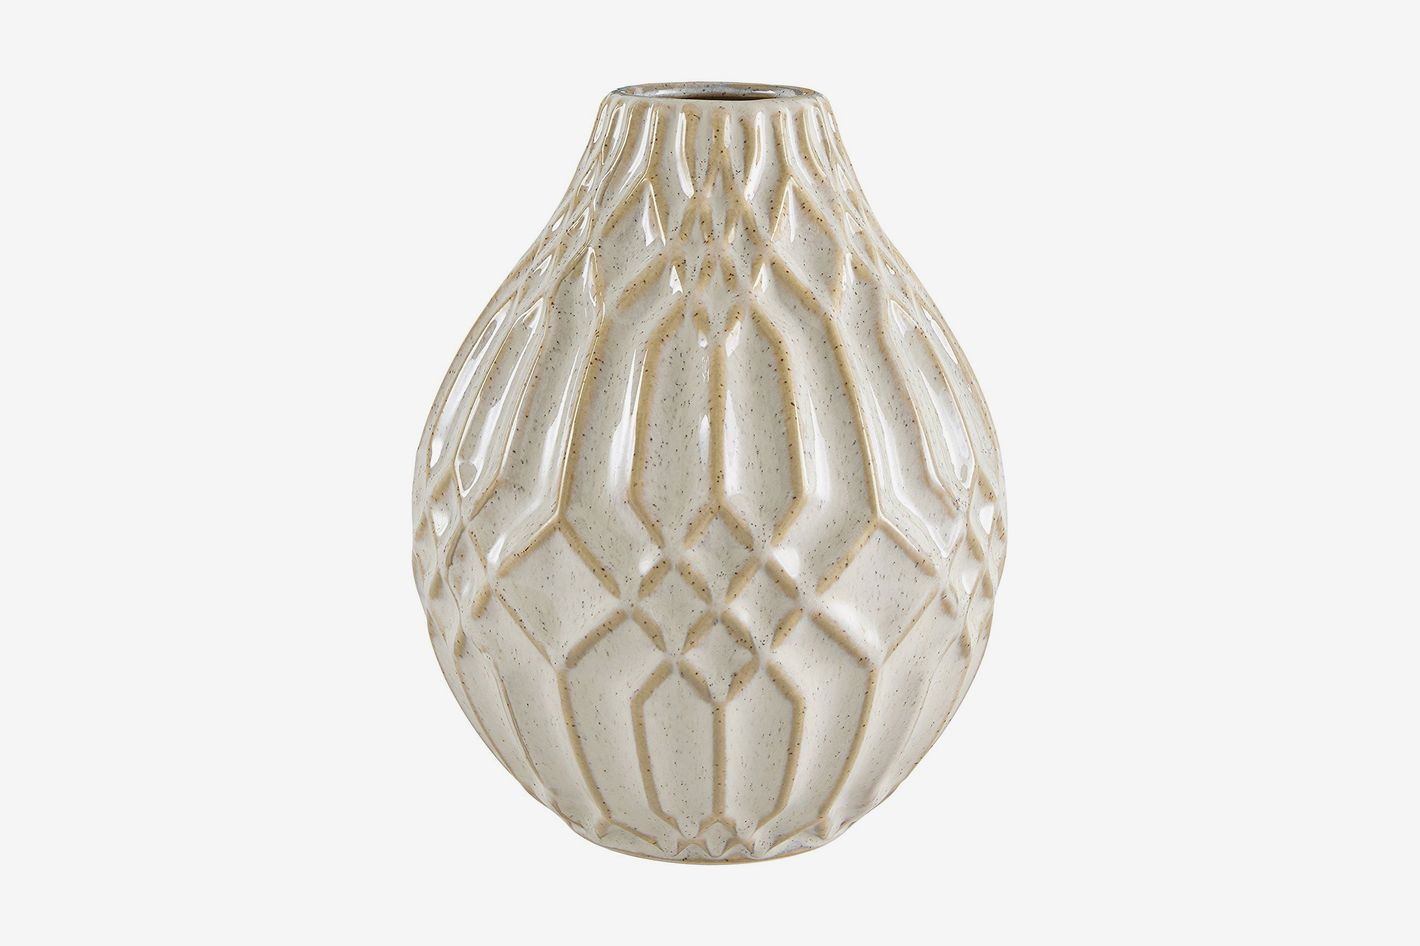 Stone & Beam Modern Ceramic Vase With Geometric Pattern, 7.7-inch, White